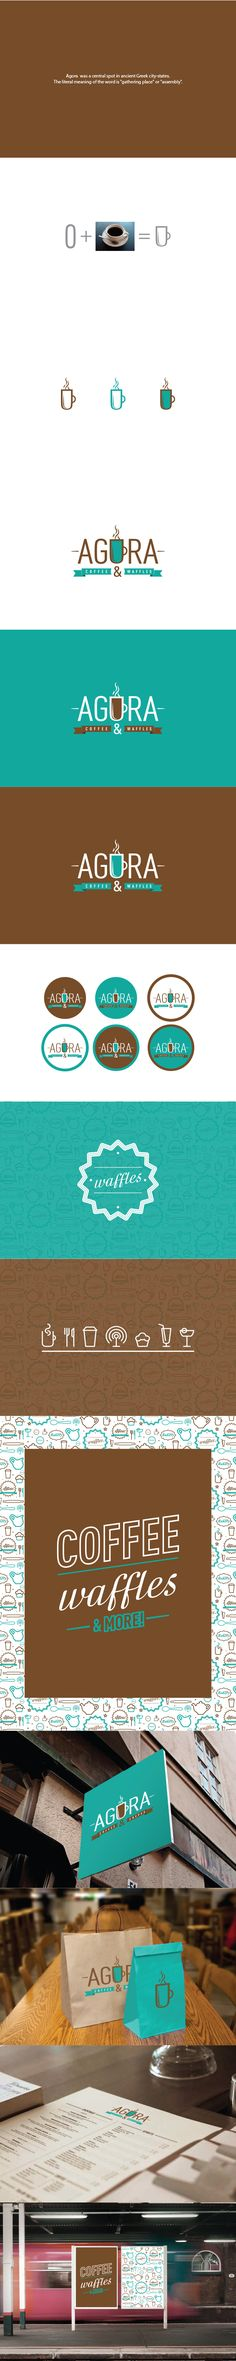 AGORA by Sherif Adel | #stationary #corporate #design #corporatedesign #logo #identity #branding #marketing <<< repinned by an #advertising agency from #Hamburg / #Germany - www.BlickeDeeler.de | Follow us on www.facebook.com/BlickeDeeler